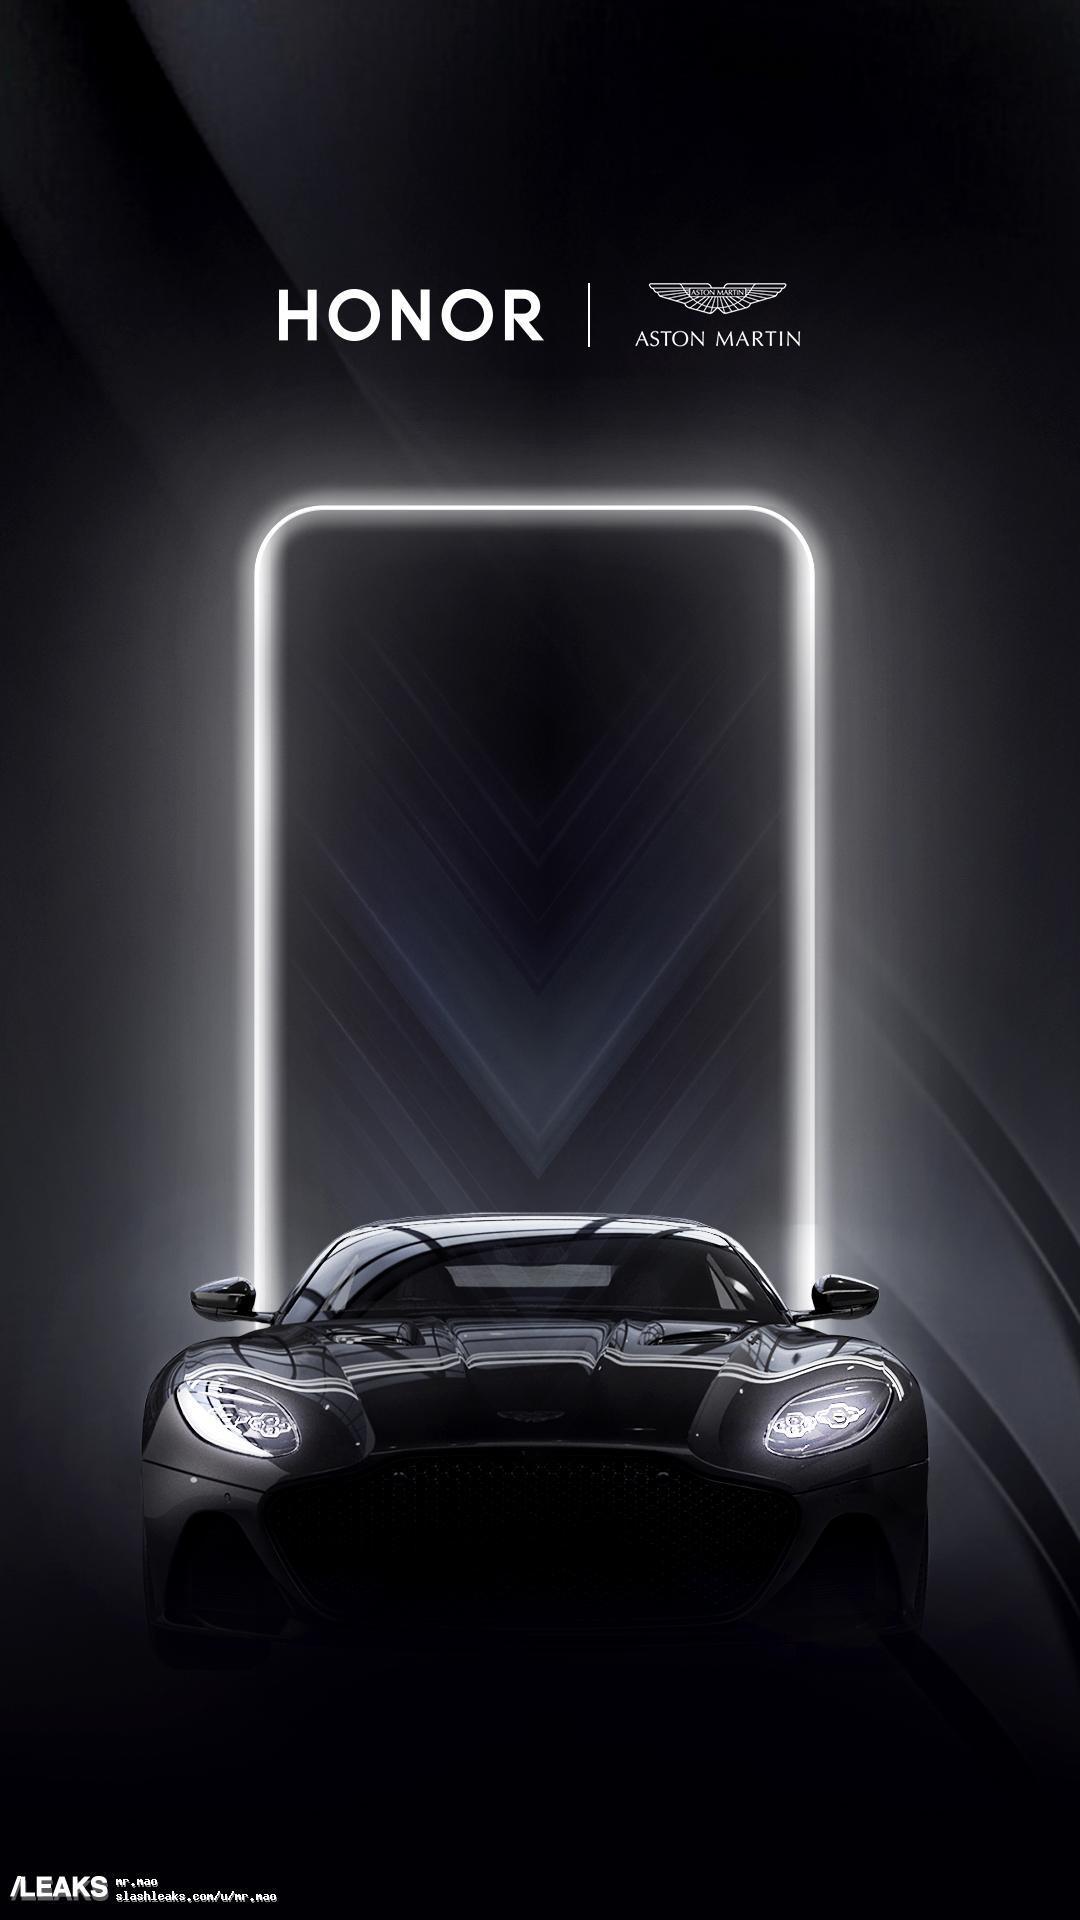 Honor - Aston Martin partenariat